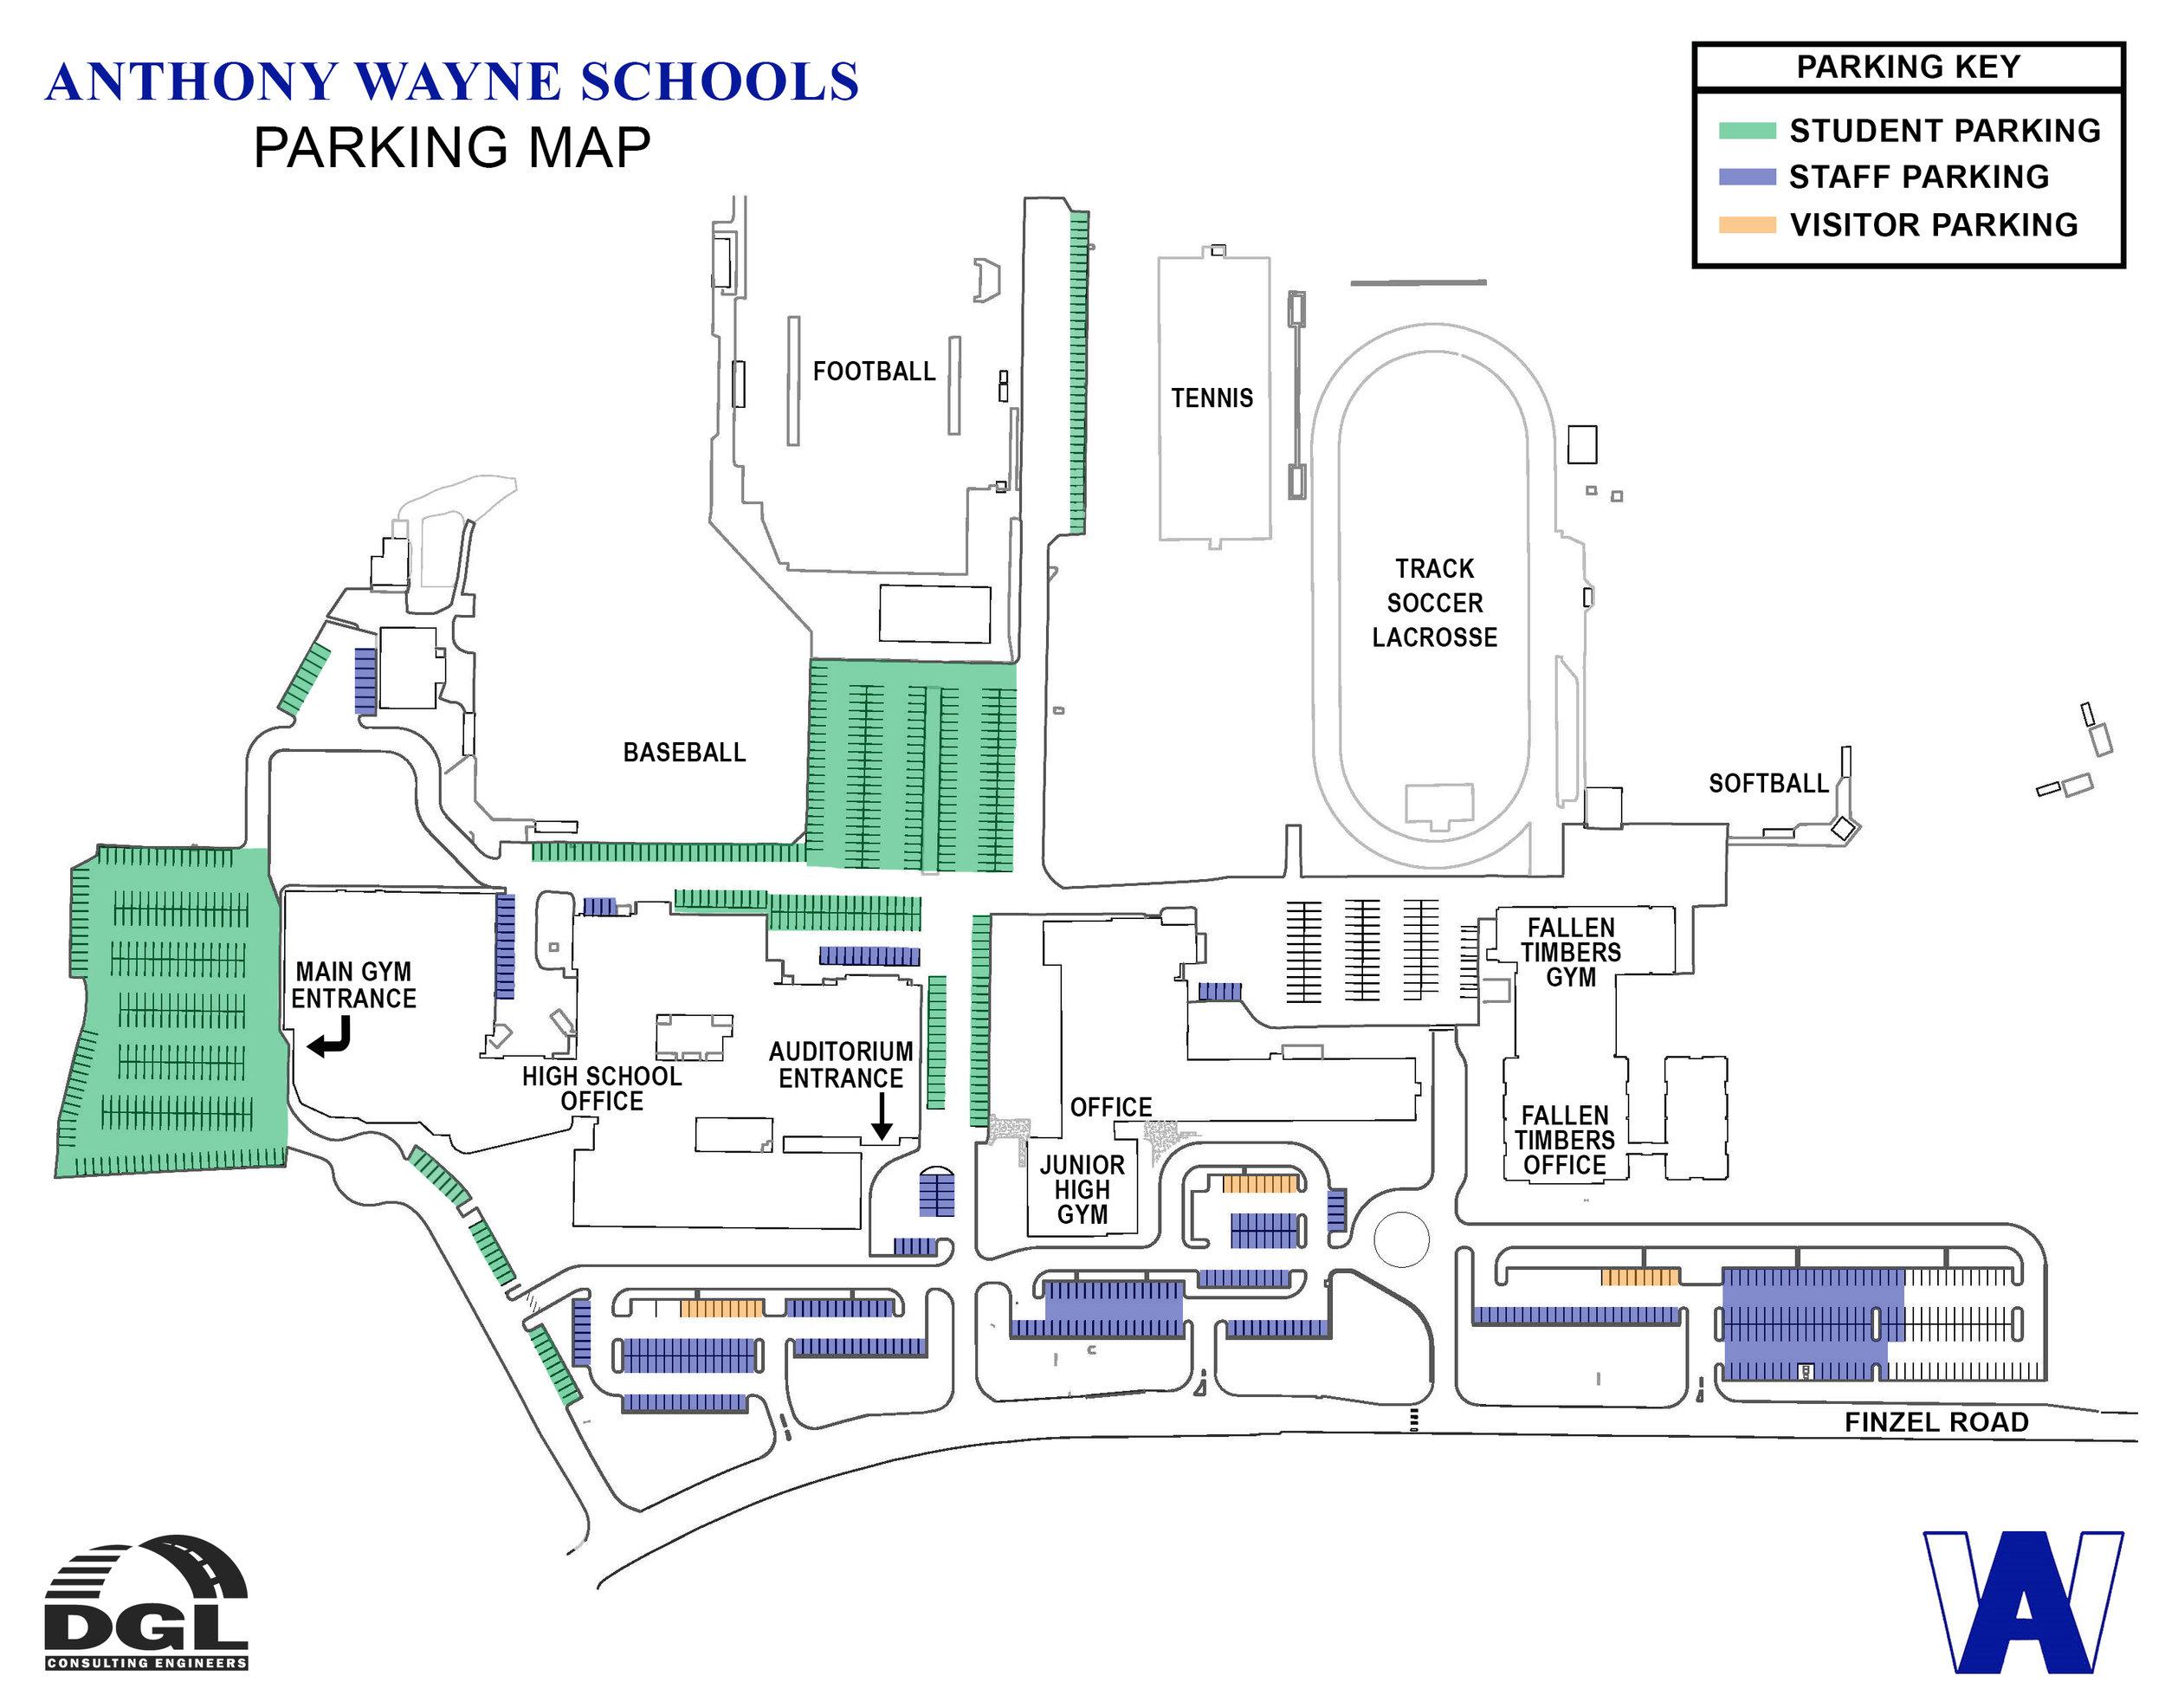 Anthony Wayne Schools Parking Map